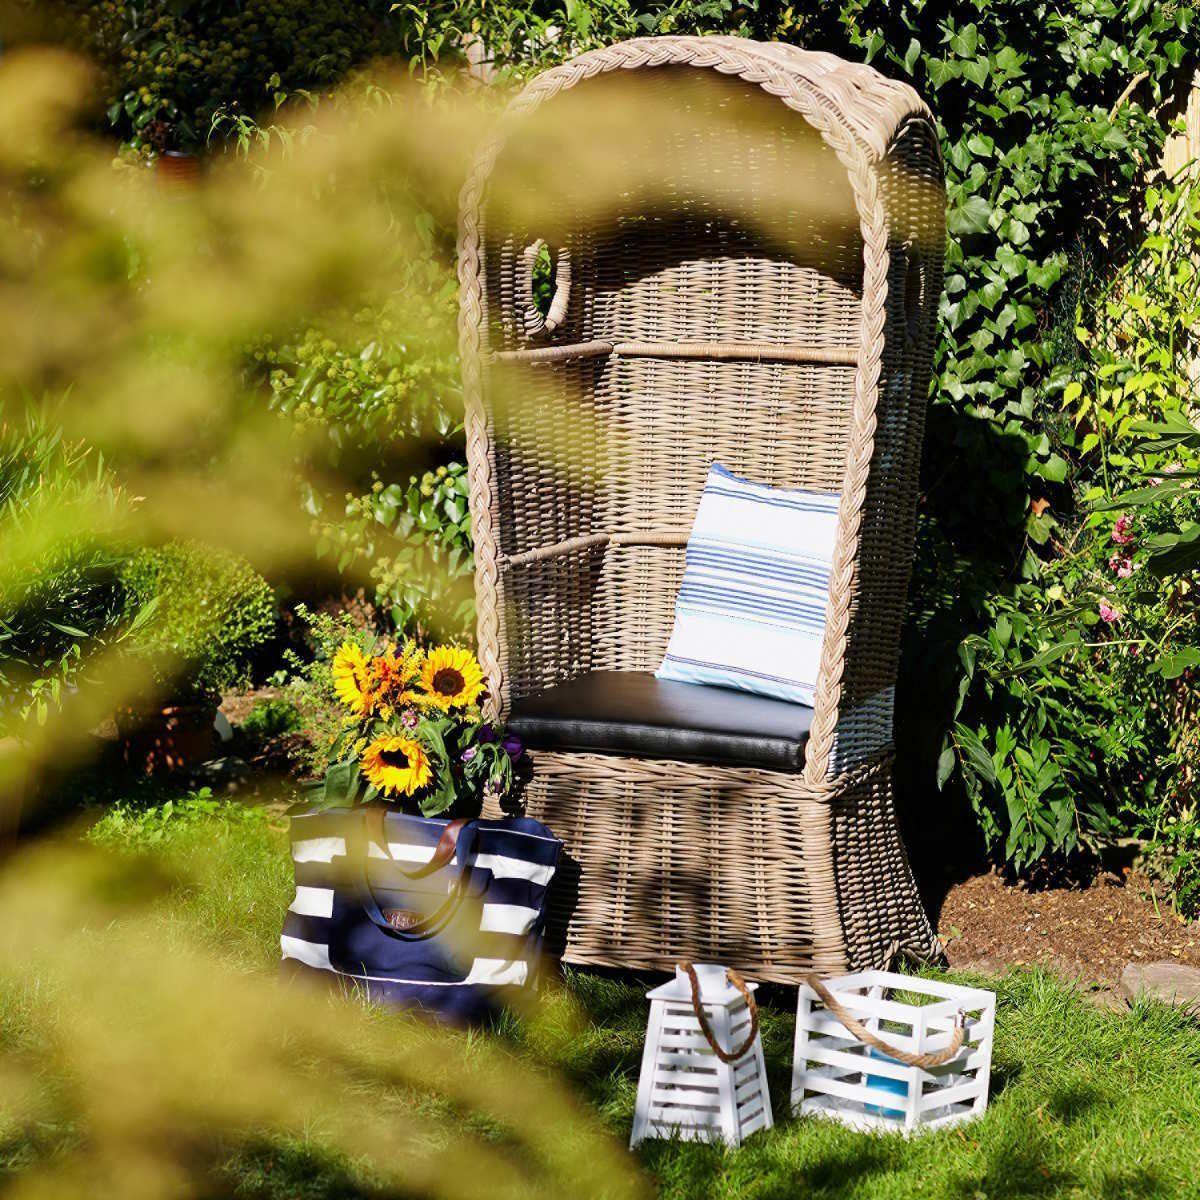 butlers lido strandkorb k che haushalt strandkorb pinterest strandkorb. Black Bedroom Furniture Sets. Home Design Ideas